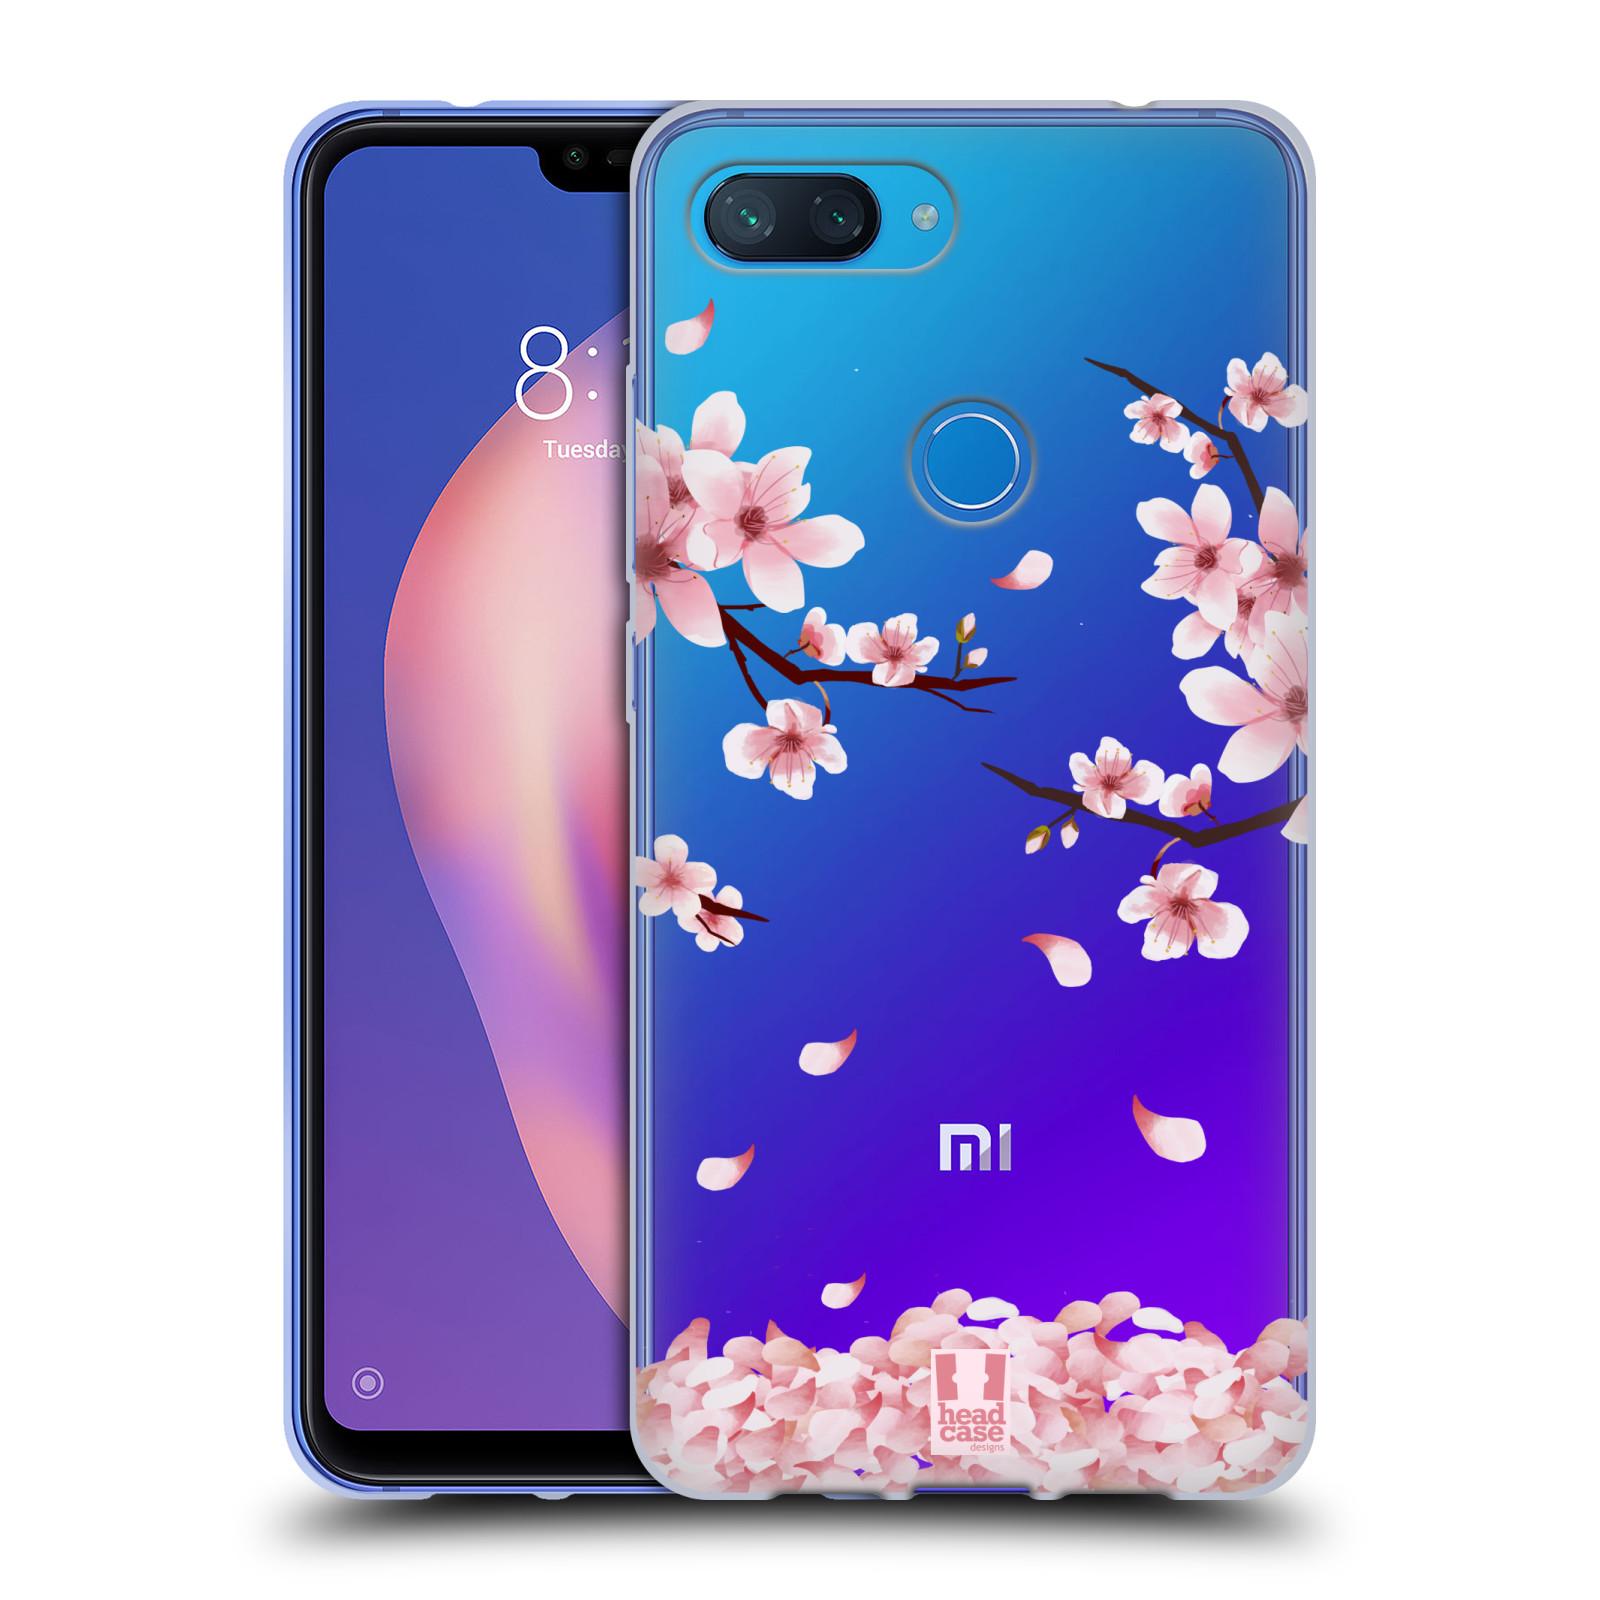 Silikonové pouzdro na mobil Xiaomi Mi 8 Lite - Head Case - Květy a větvičky